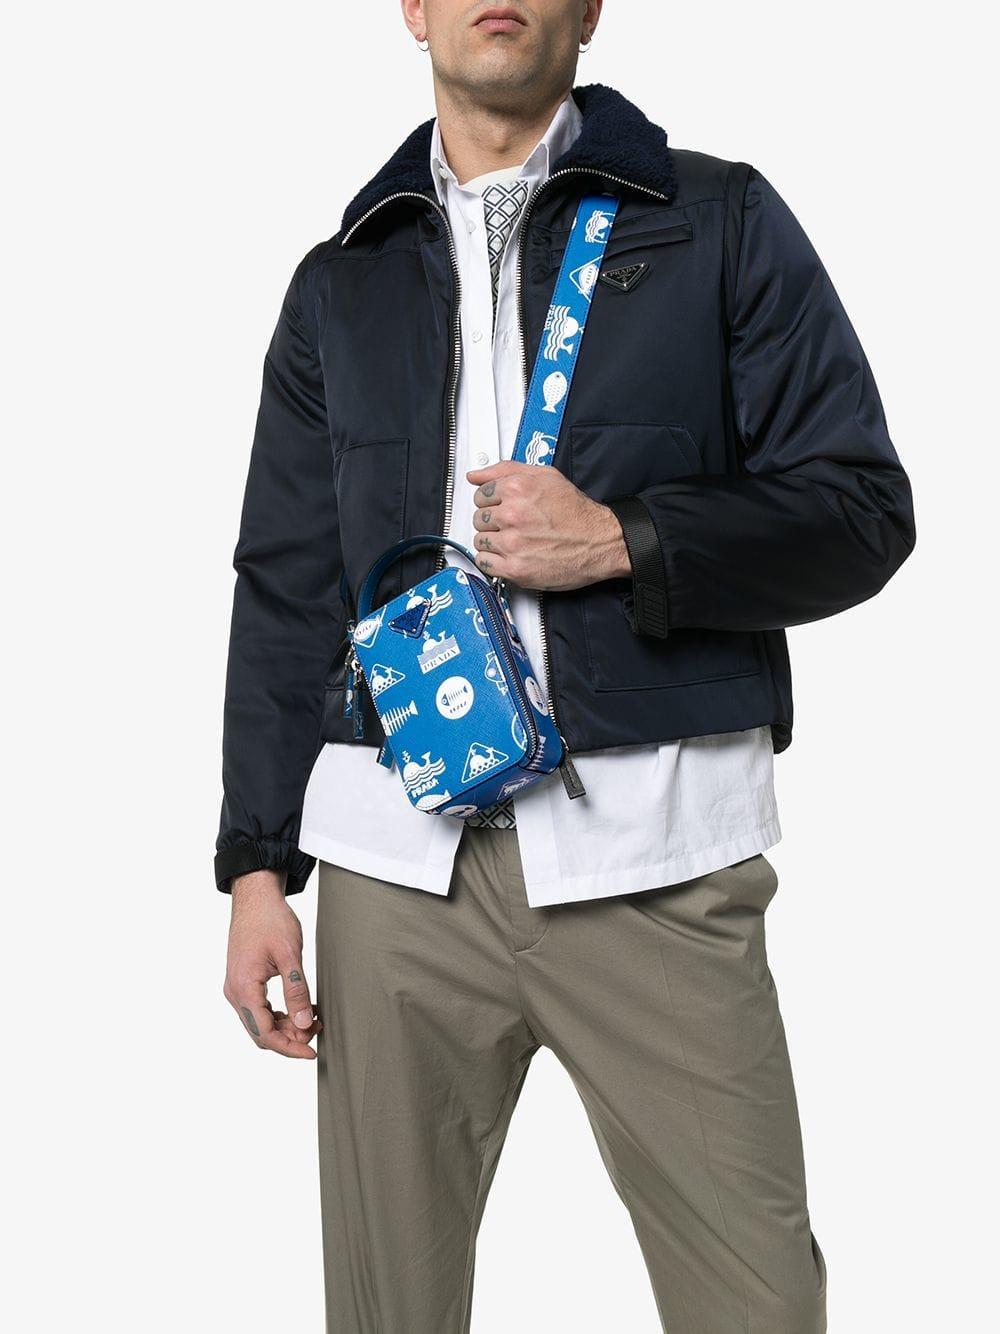 Lyst - Prada Blue Fish Print Leather Cross Body Bag in Blue for Men b05accf01e22c